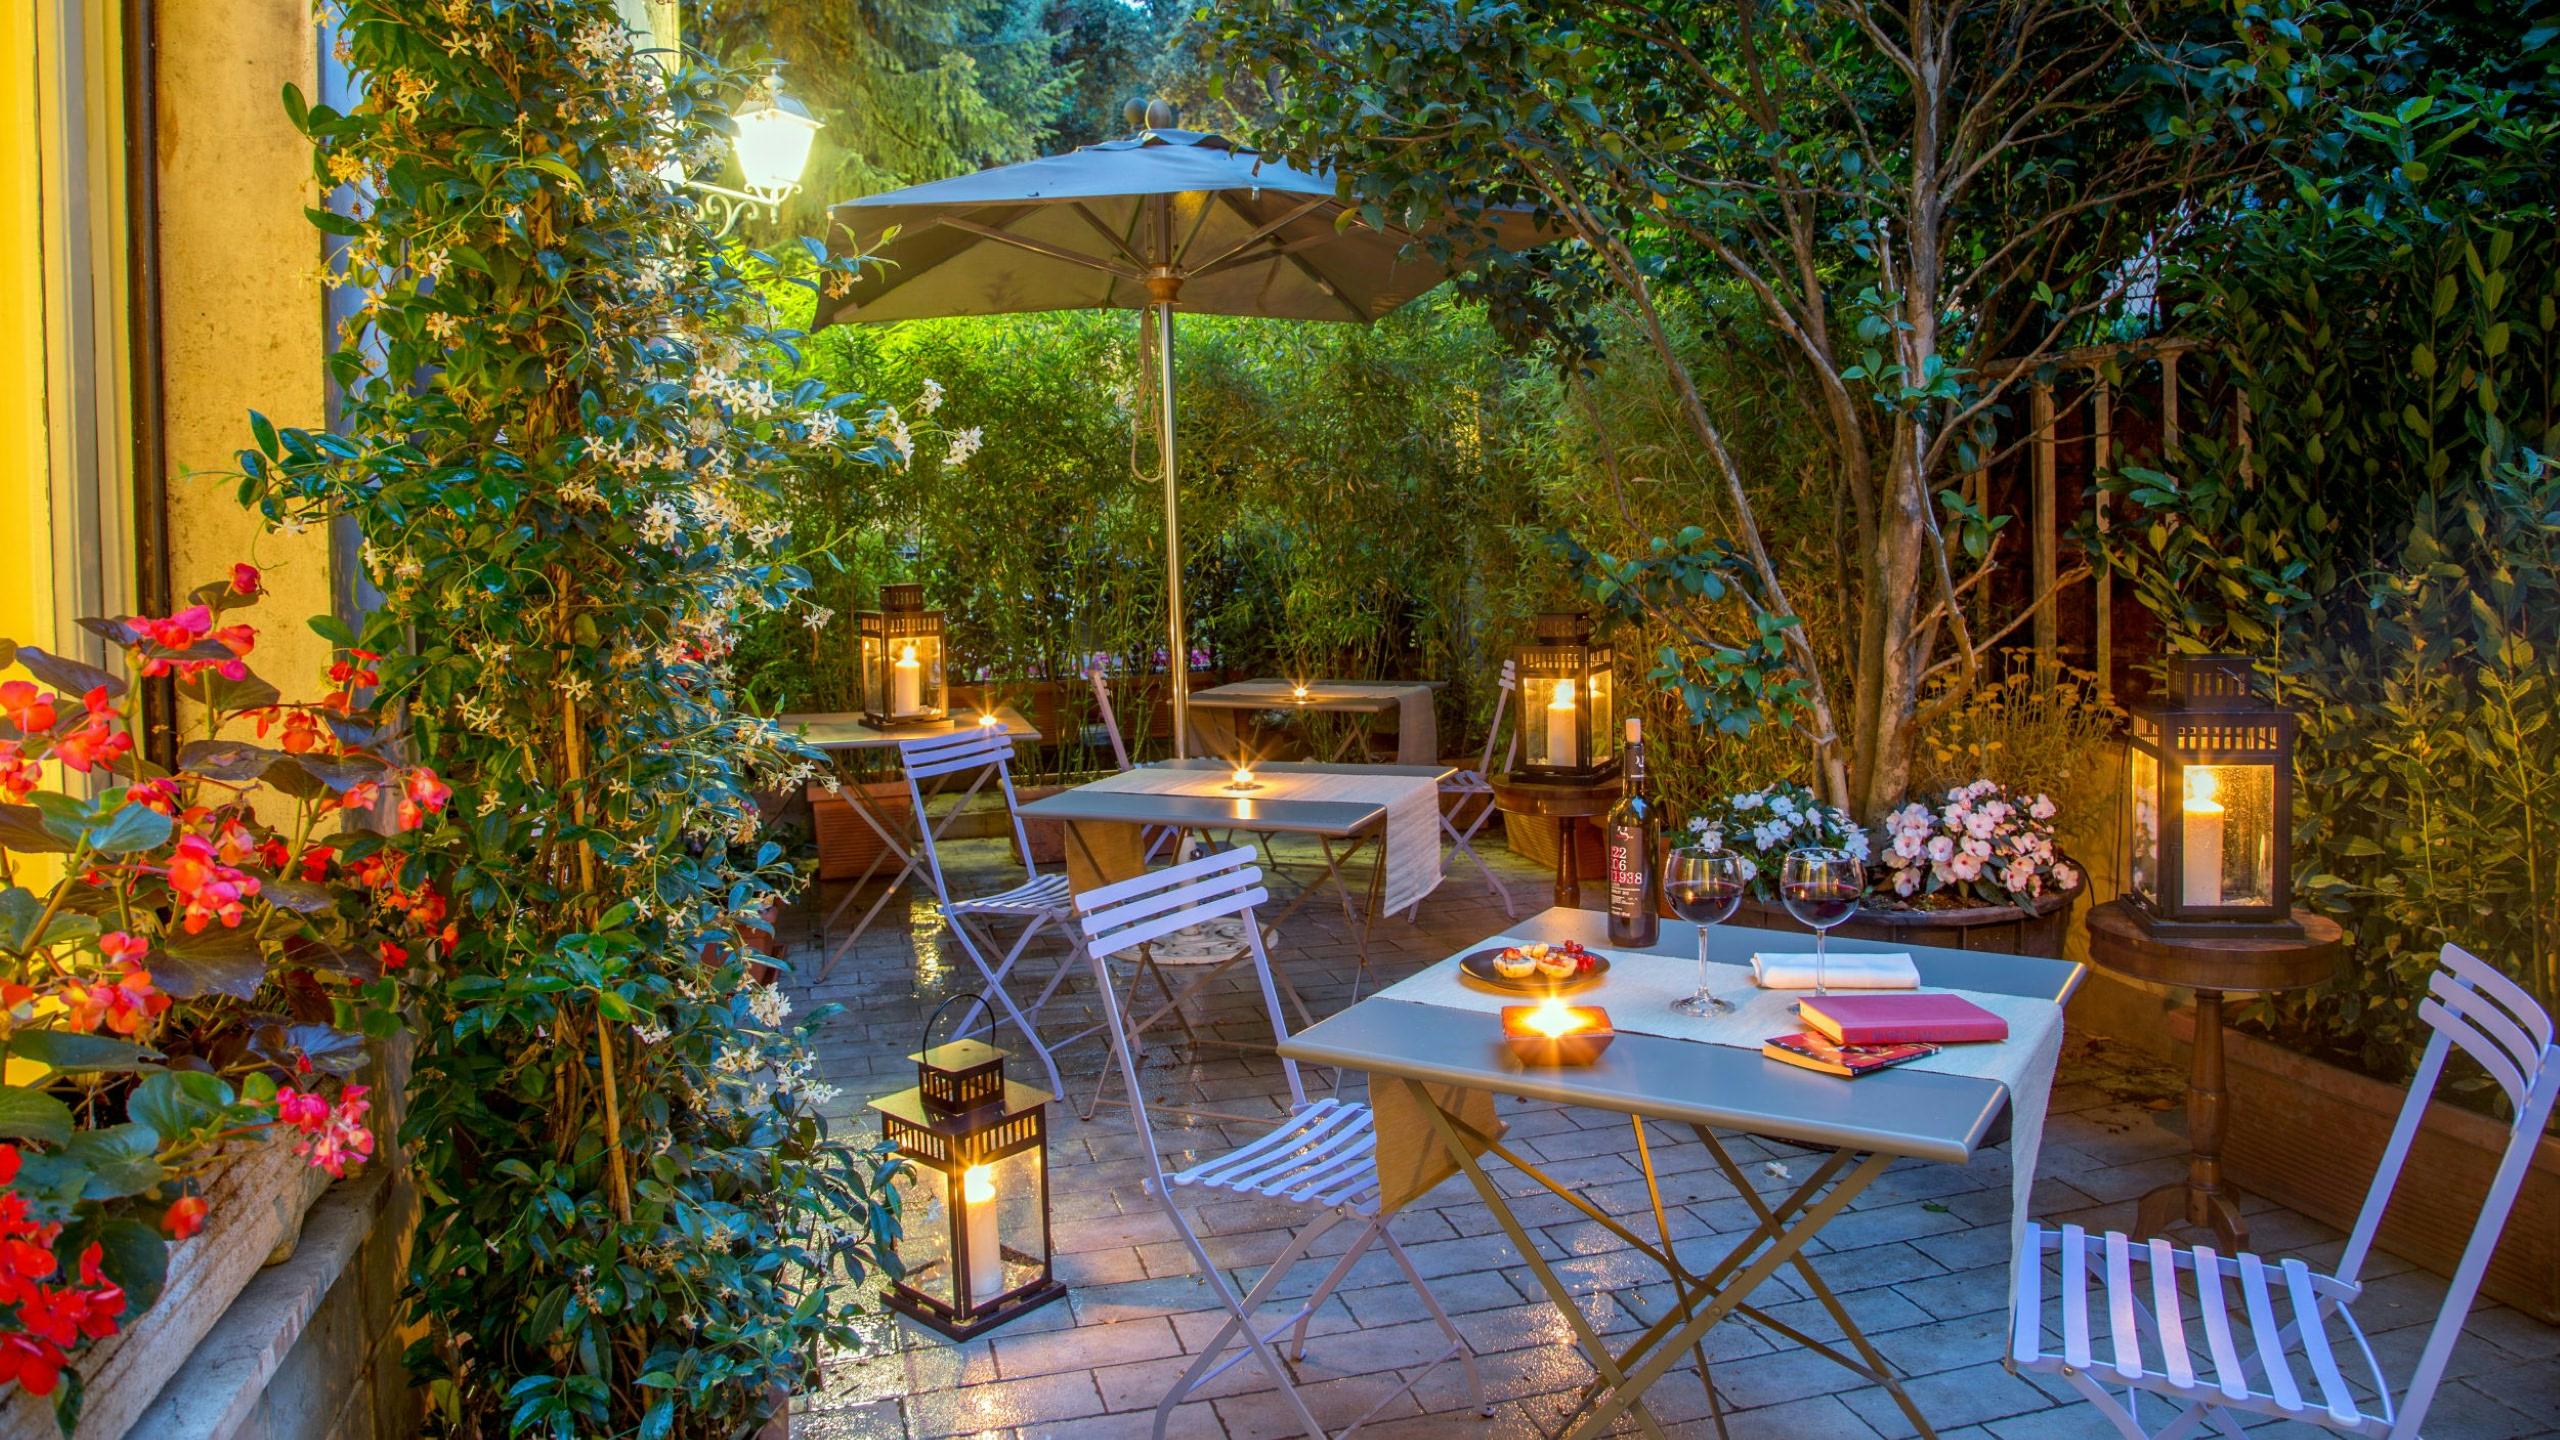 blog-rome-hints-roma-hotel-panama-garden-giardino